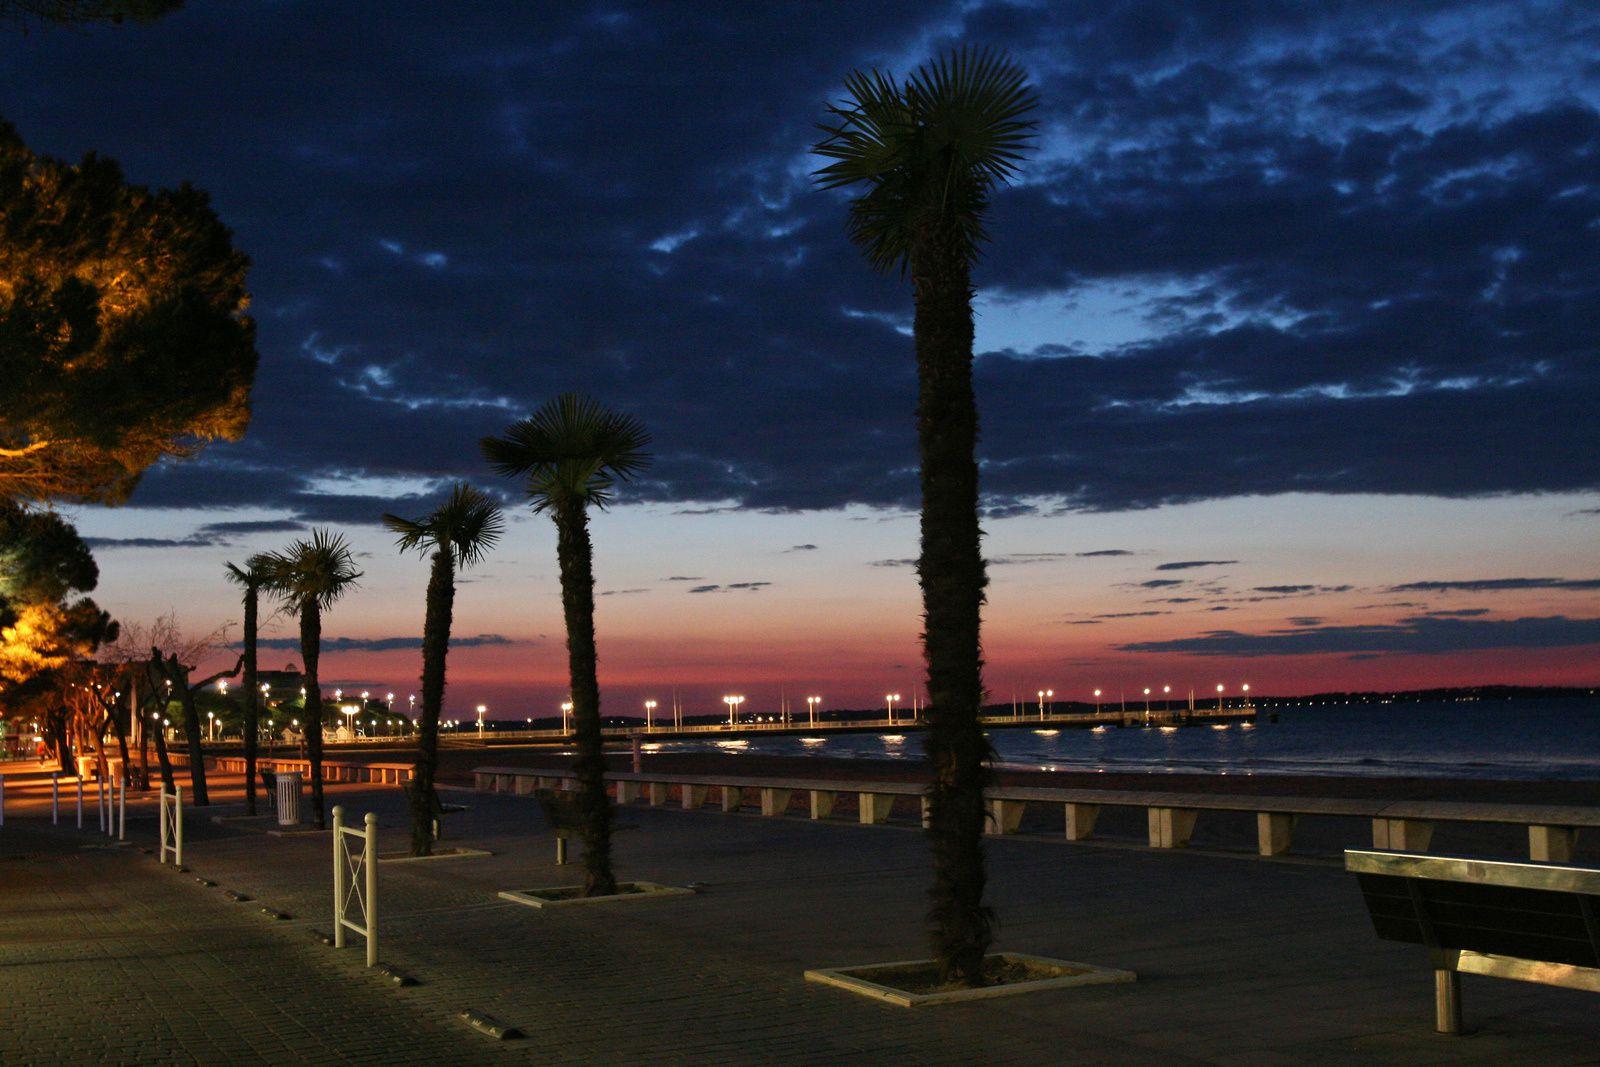 Lumière du soir en bord de mer